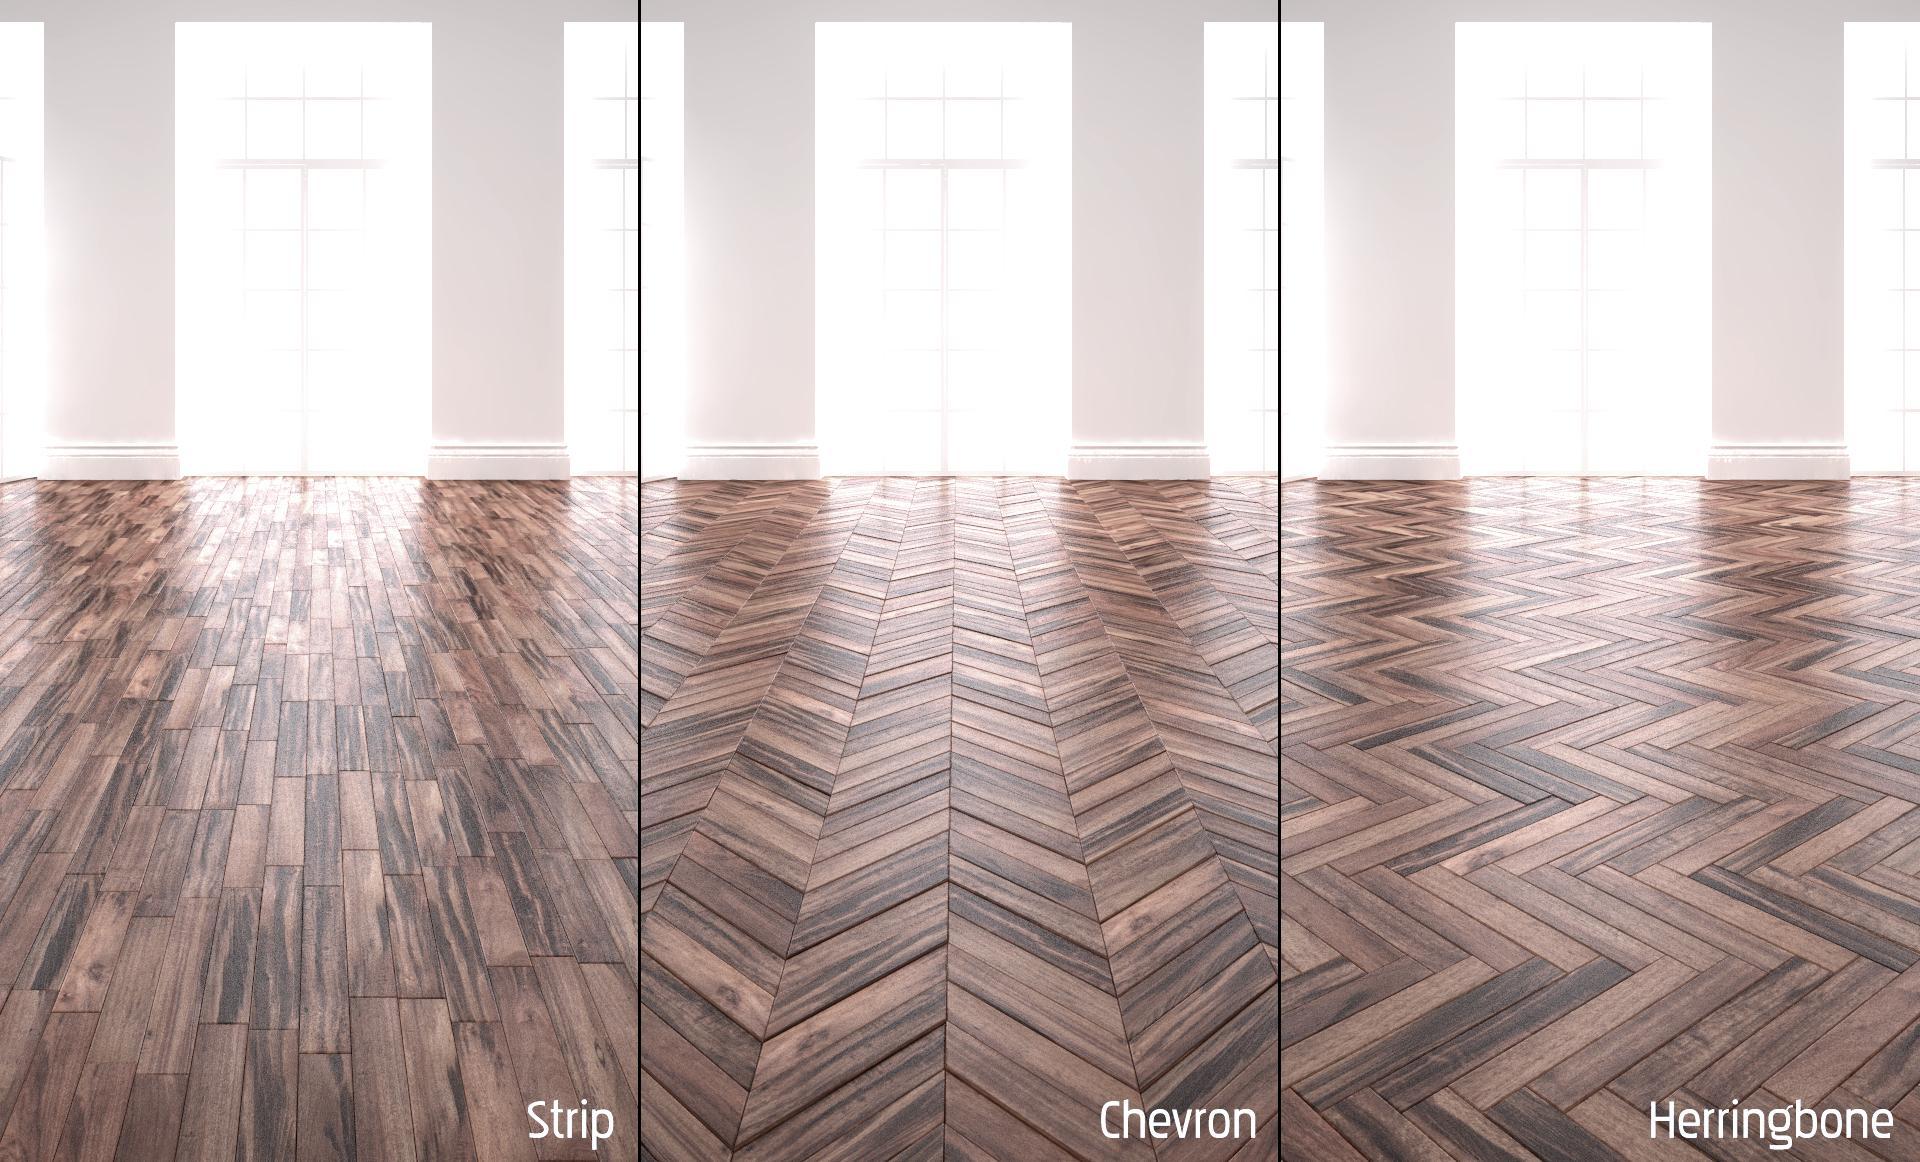 Create a parquet floor